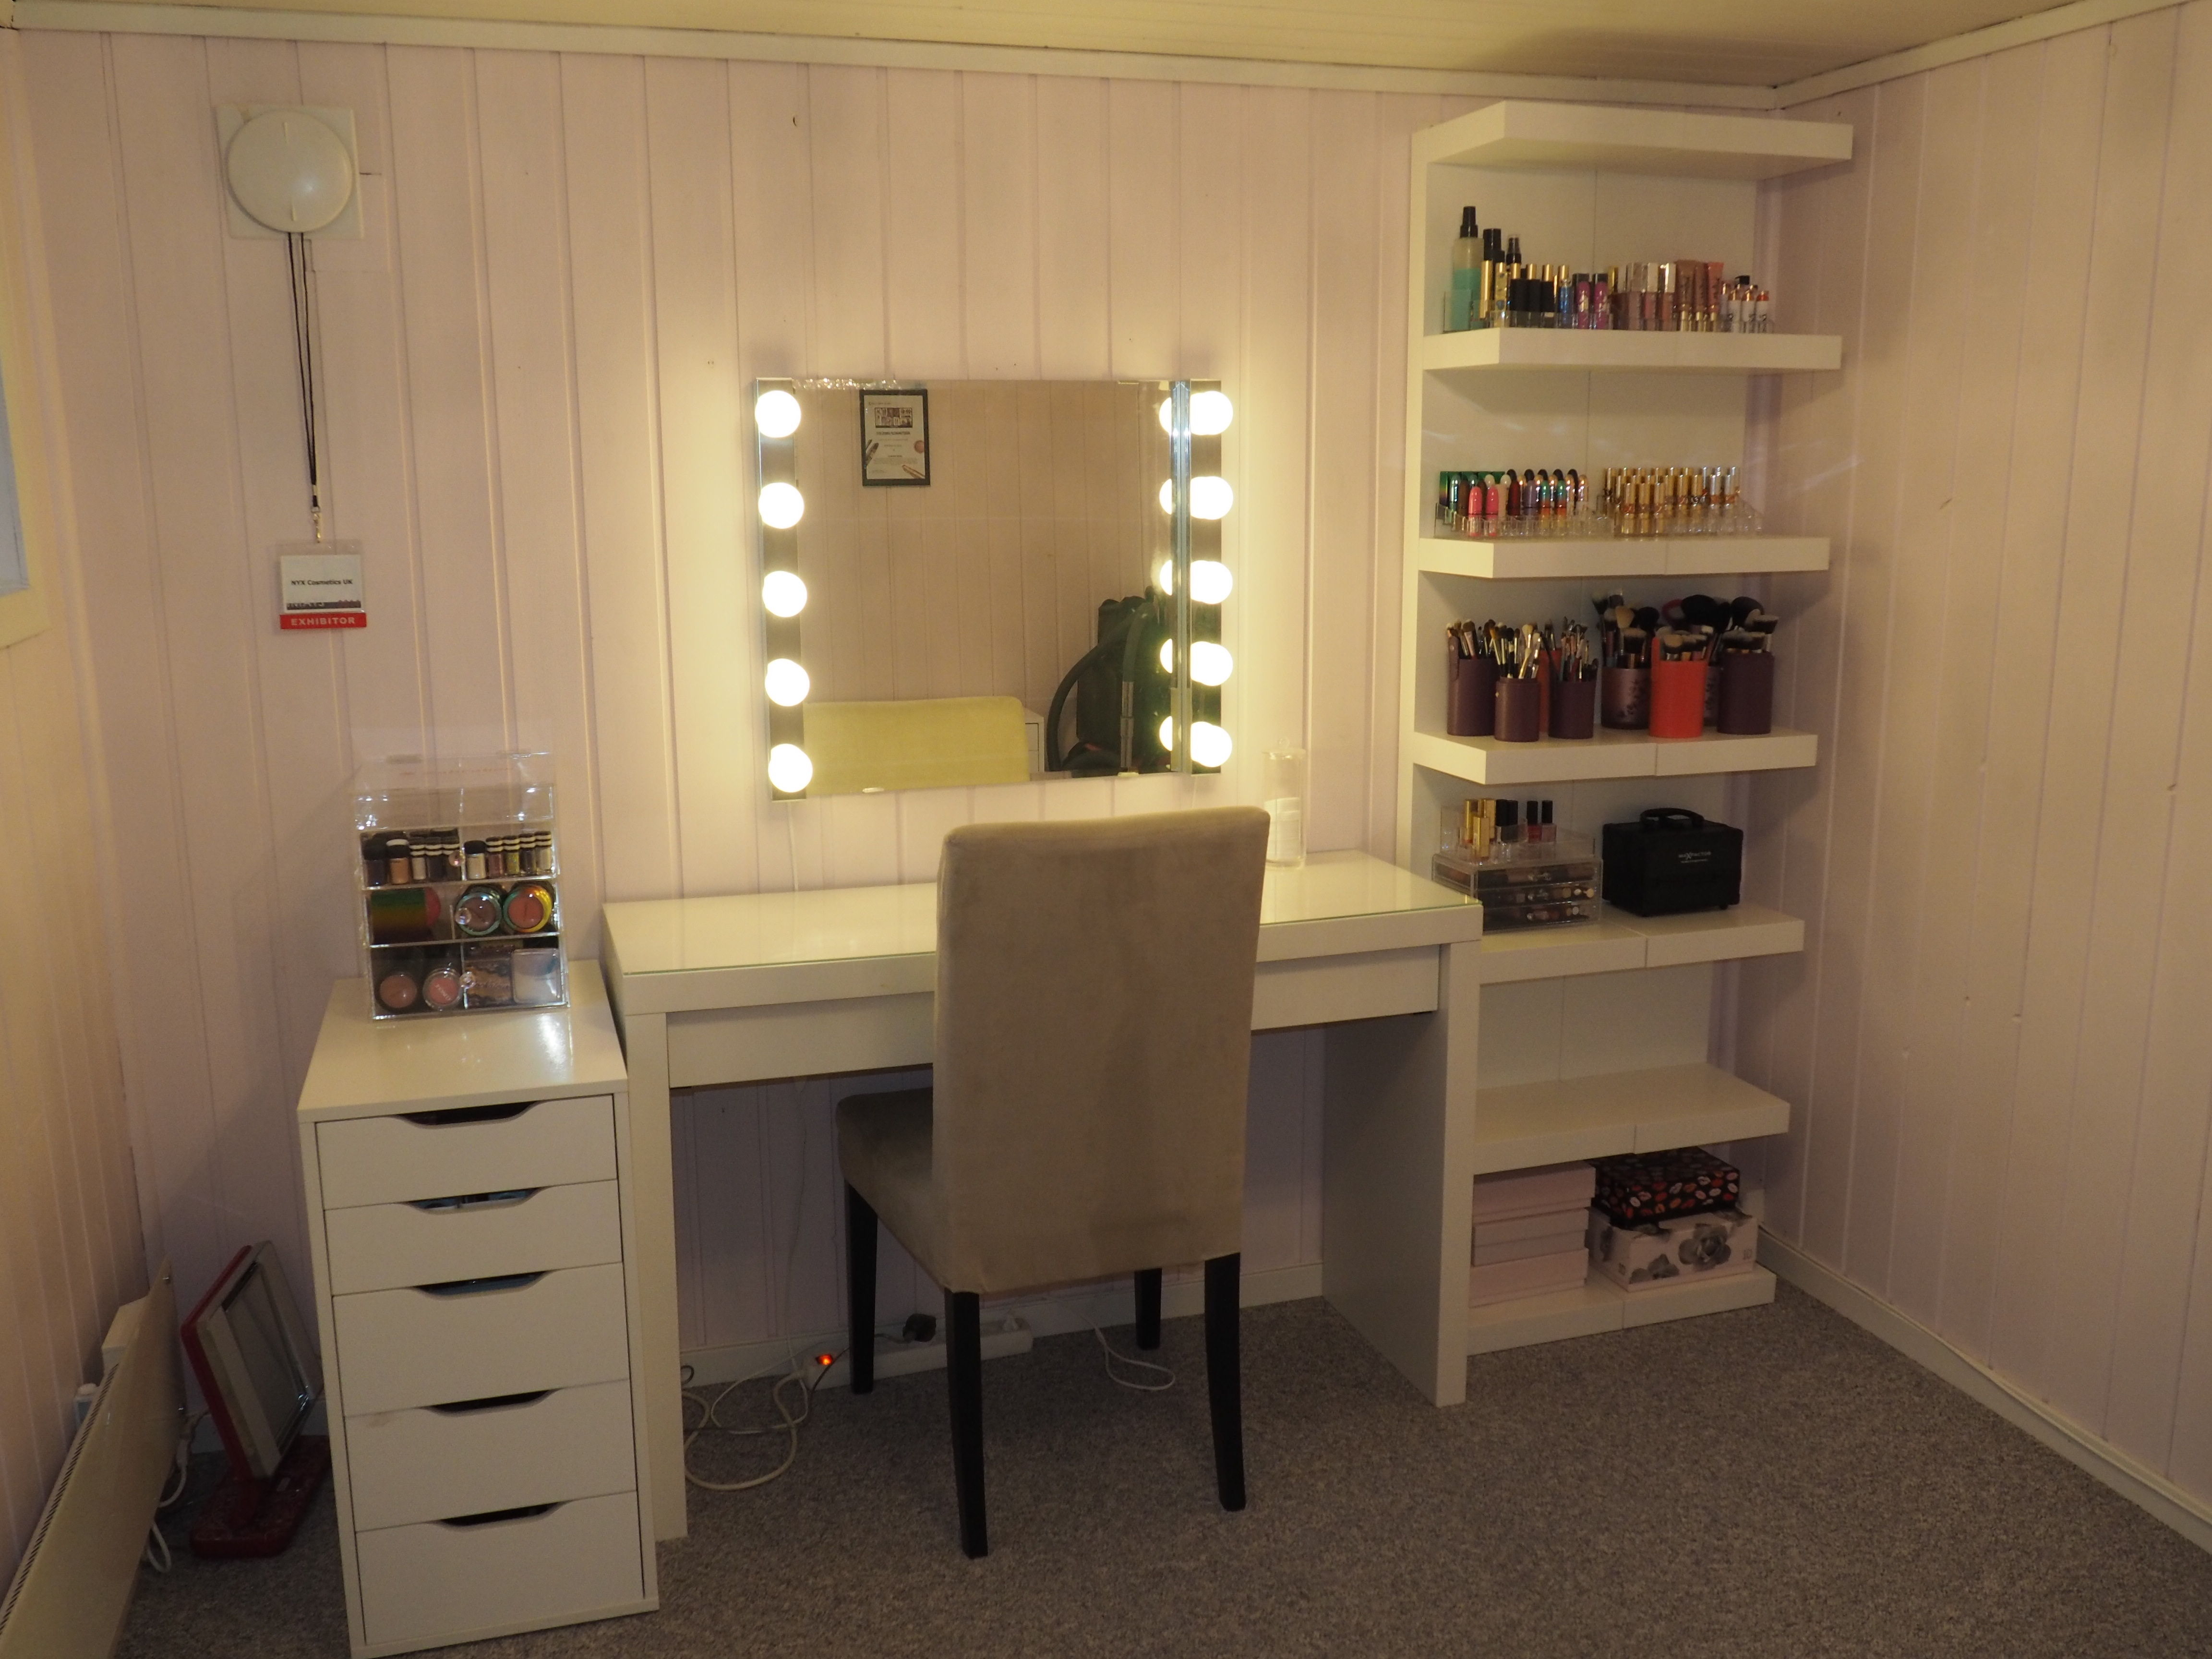 My makeup room | Silje Sundstrom on Make Up Room  id=20429